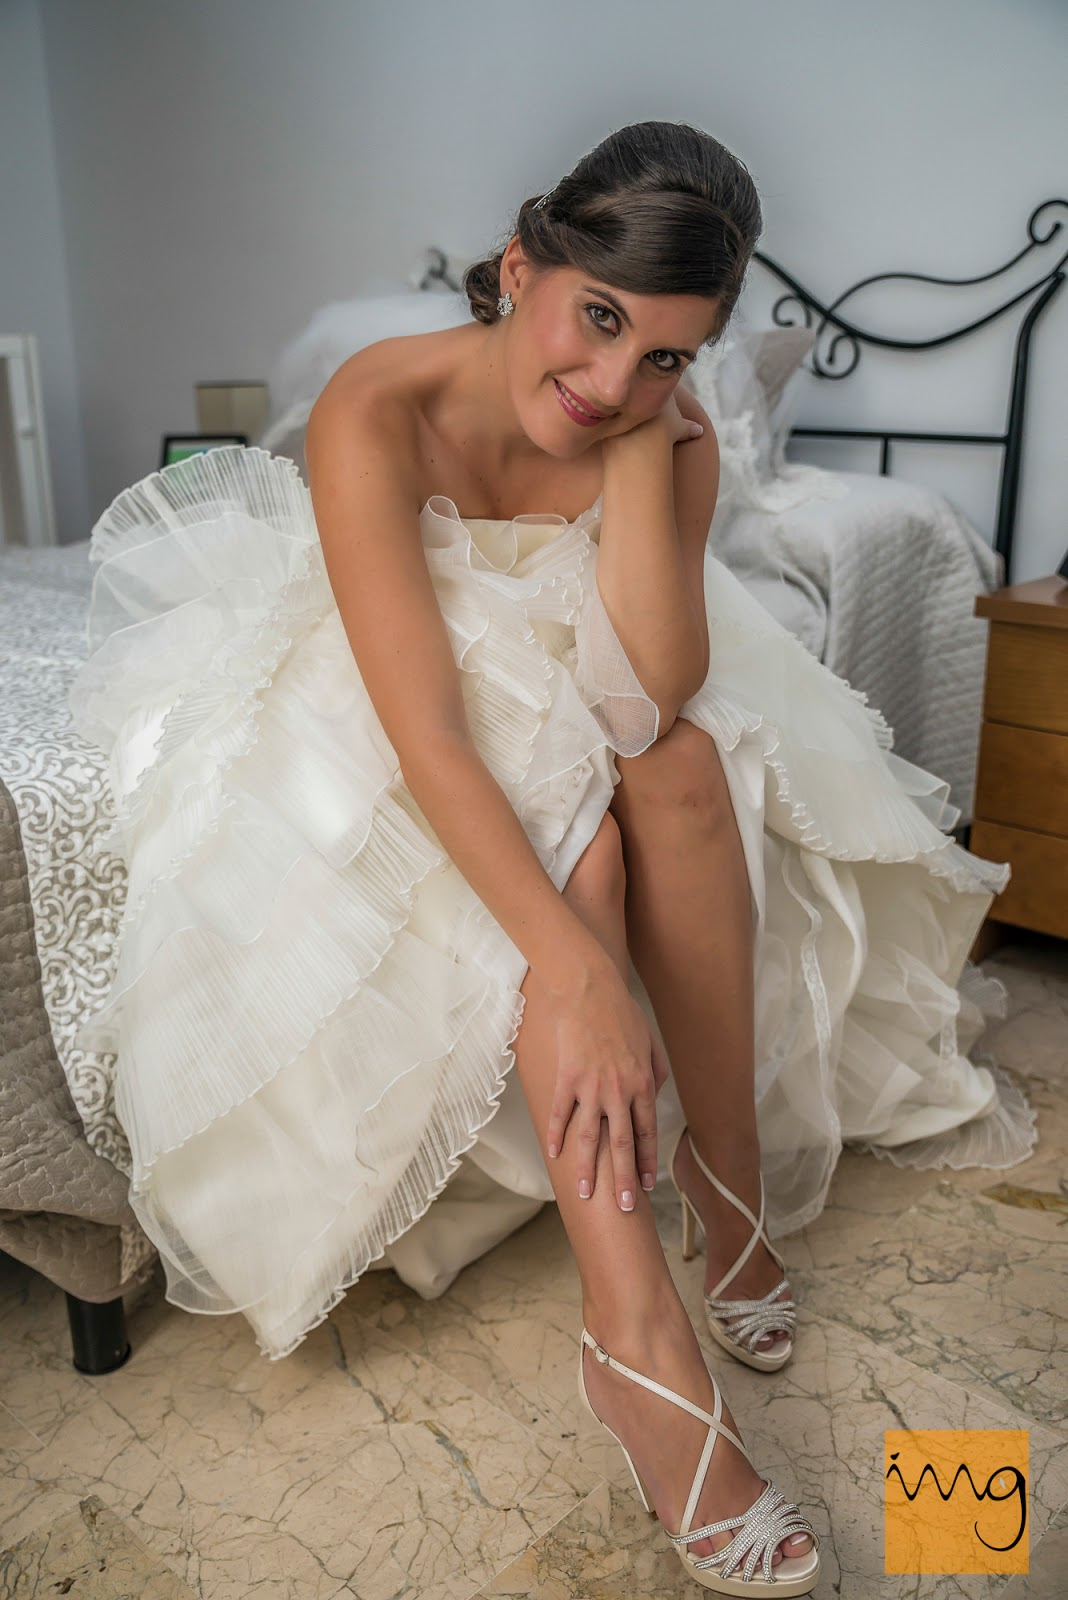 Bonita pose de la novia enseñando sus zapatos